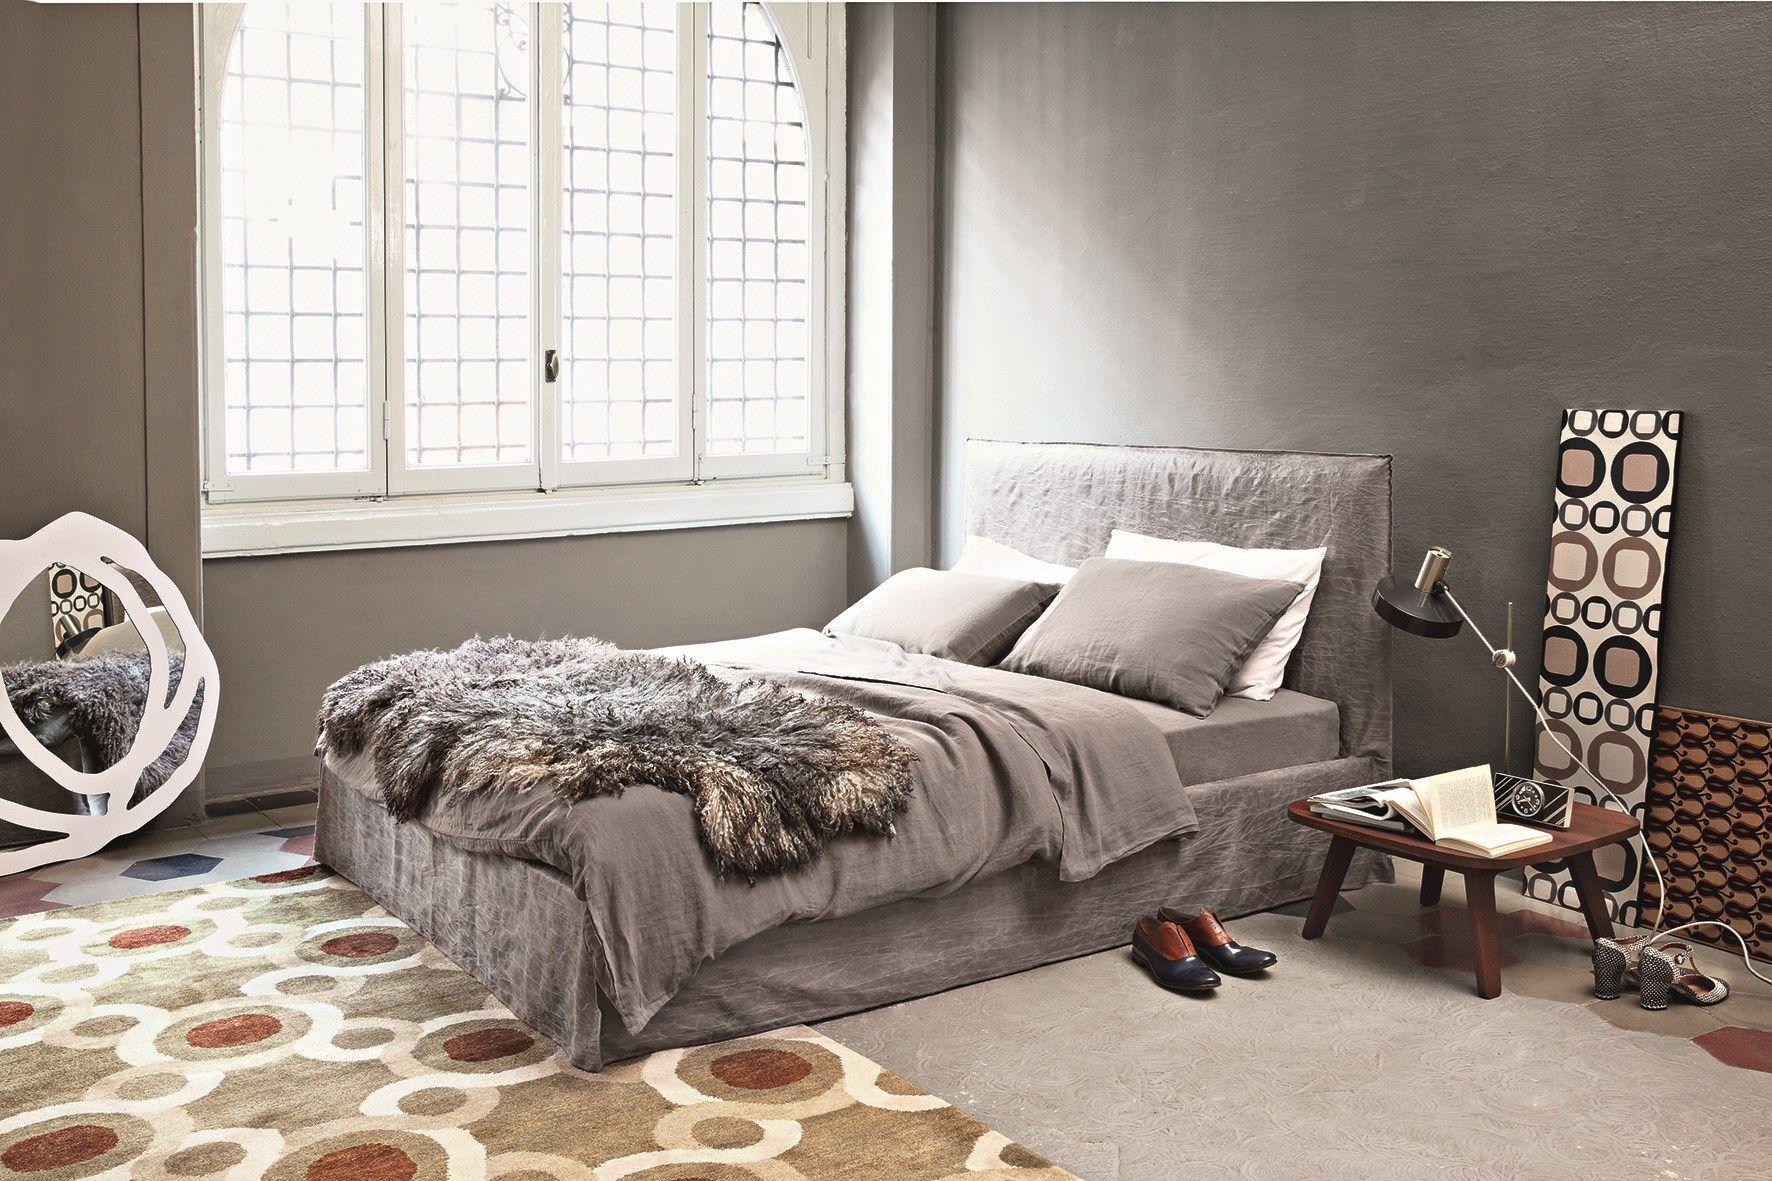 GHOST 80 E Bett Doppelbett By Gervasoni Design Paola